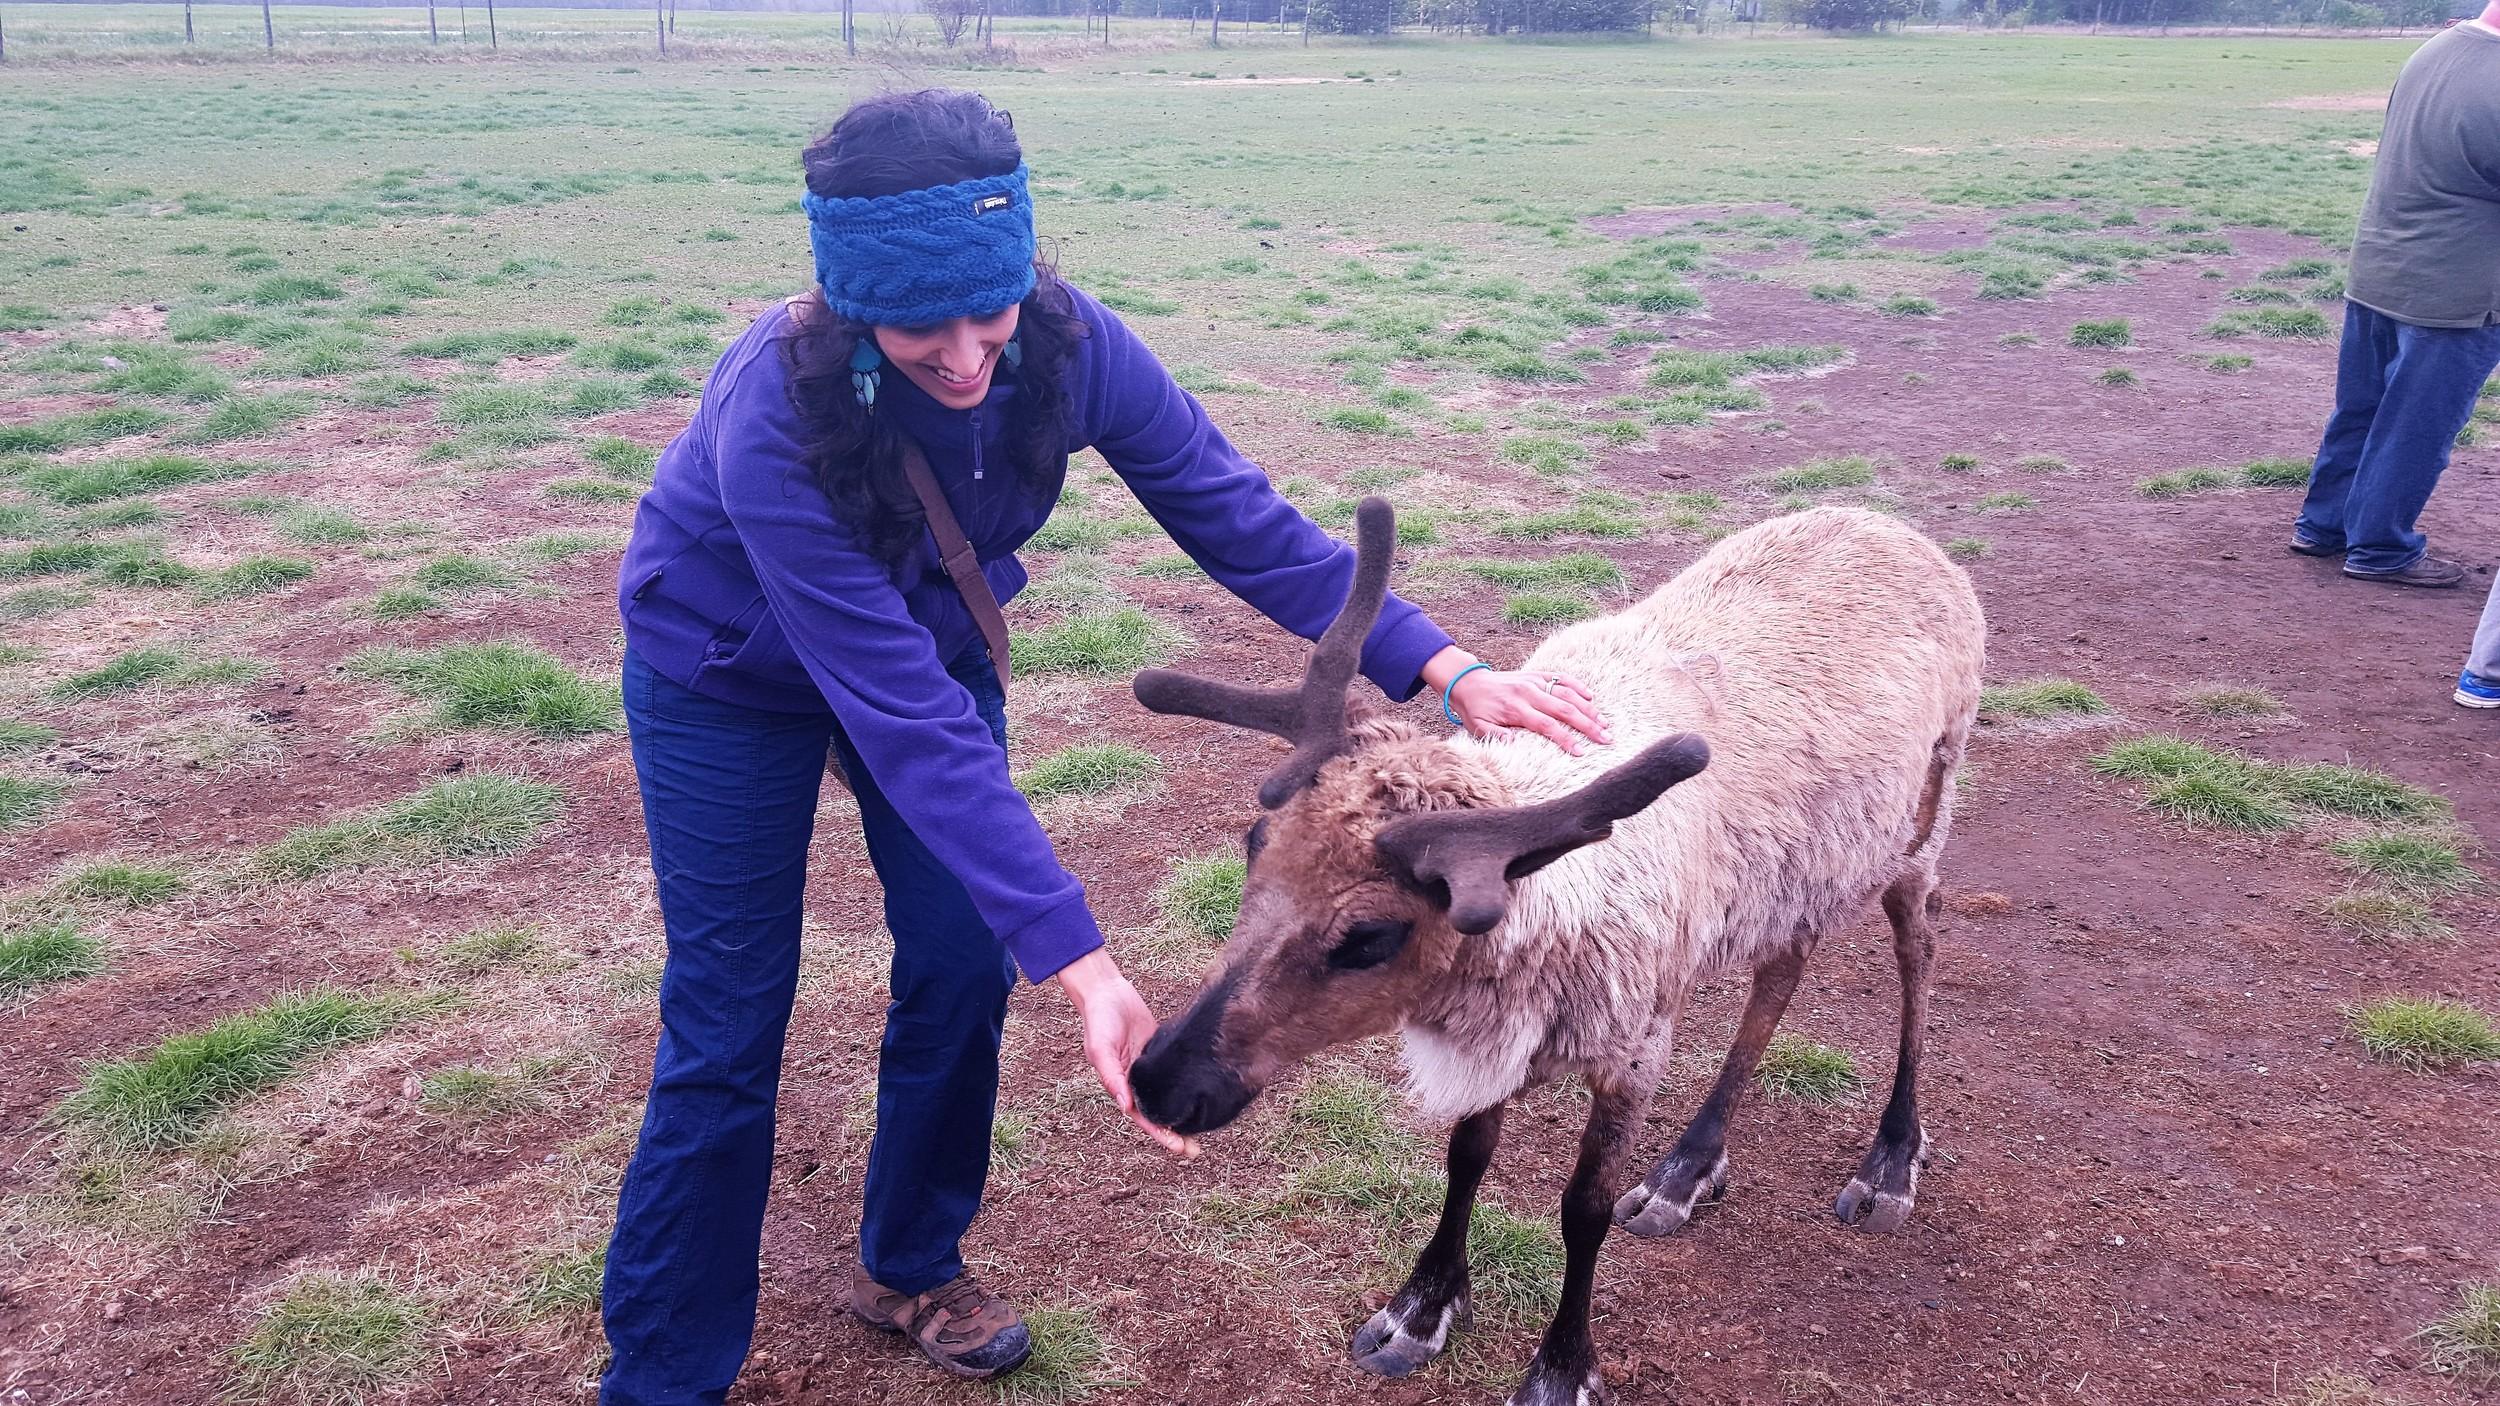 Super friendly reindeer